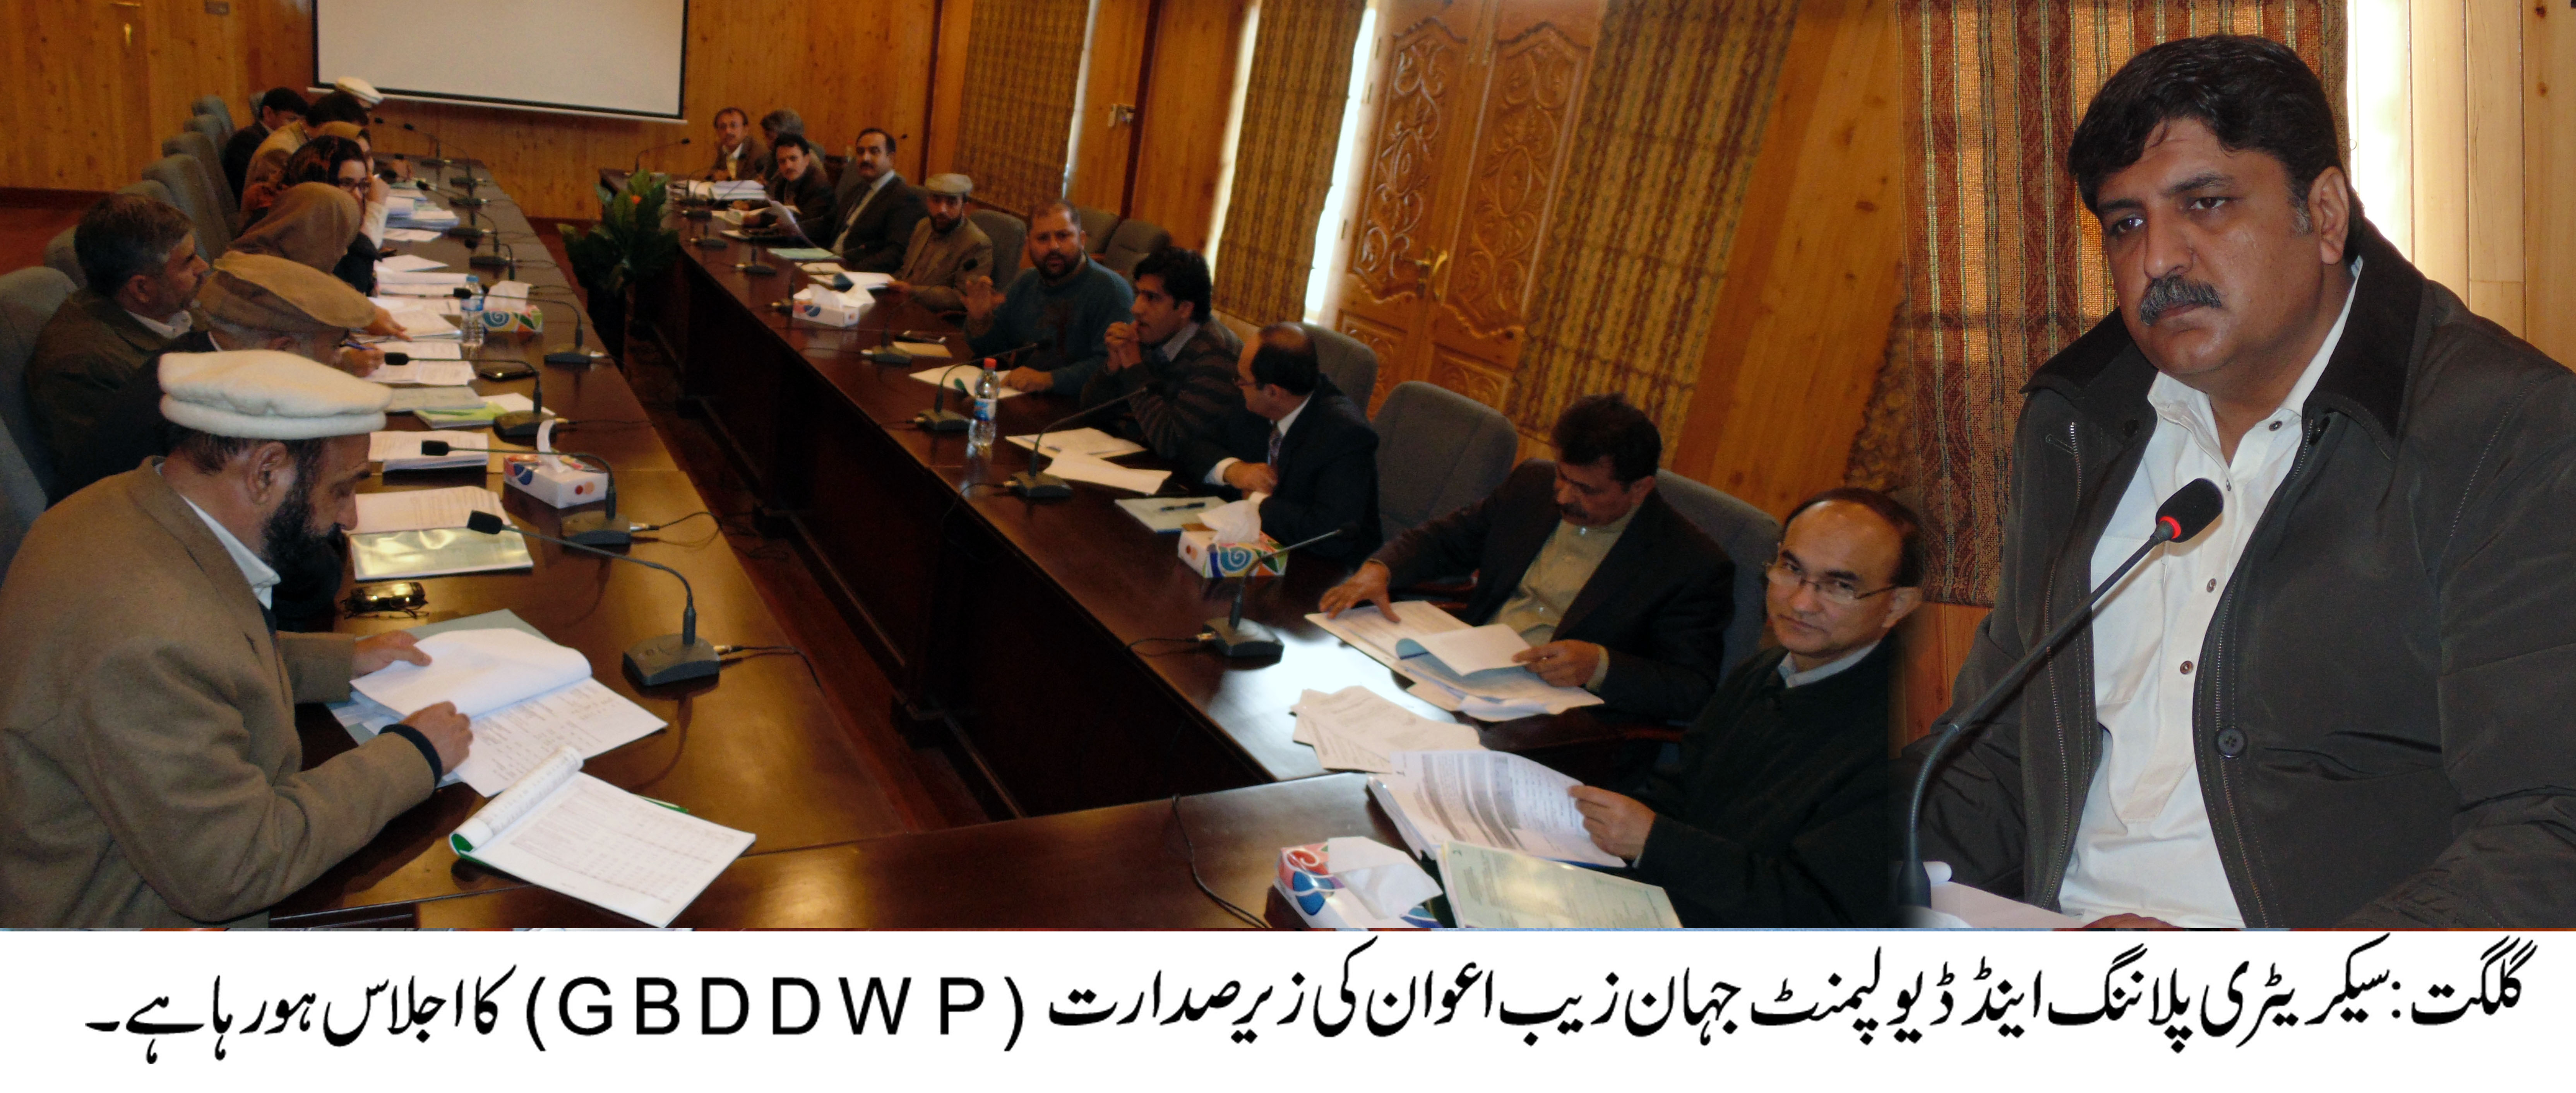 گلگت بلتستان ڈپارٹمنٹل ورکنگ پارٹی میں آٹھ ترقیاتی منصوبوں کی منظوری دی گئی